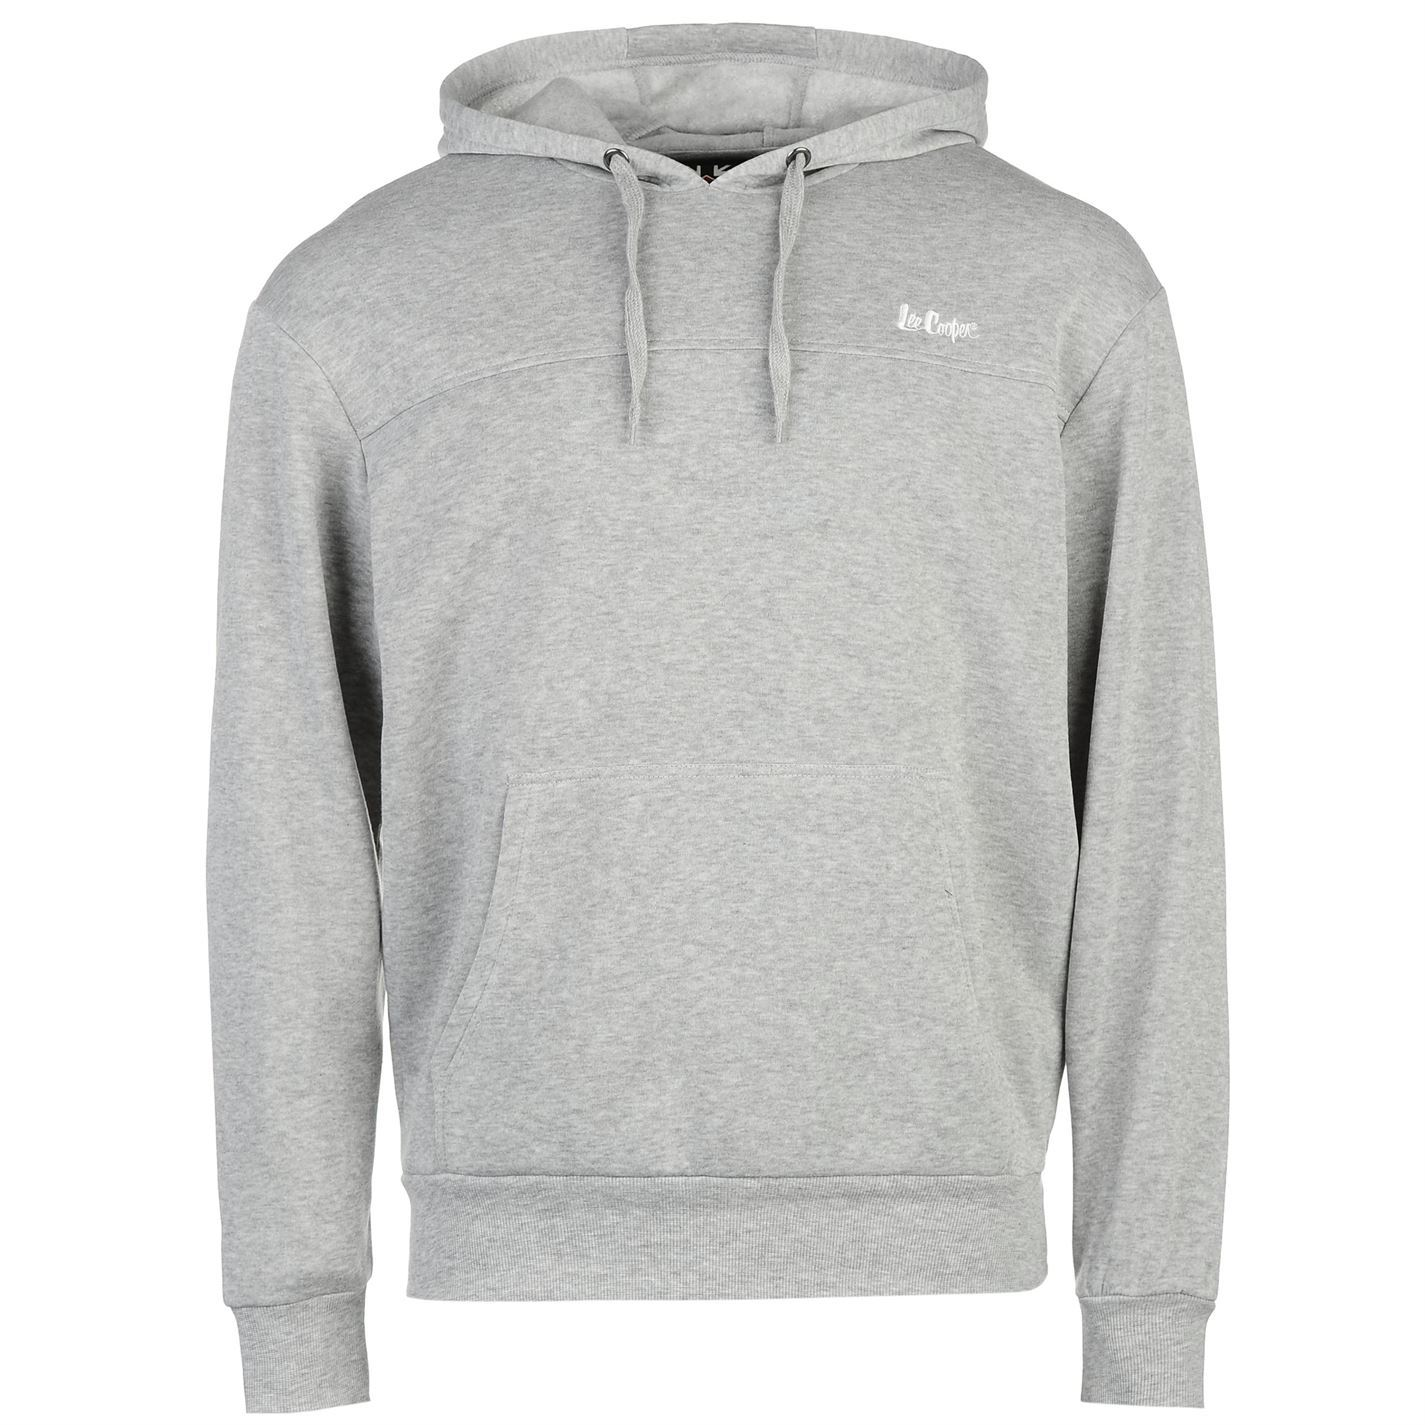 Details about Lee Cooper Pullover Hoody Mens Grey Hoodie Sweater Sweatshirt  Top 5cb3043b893f